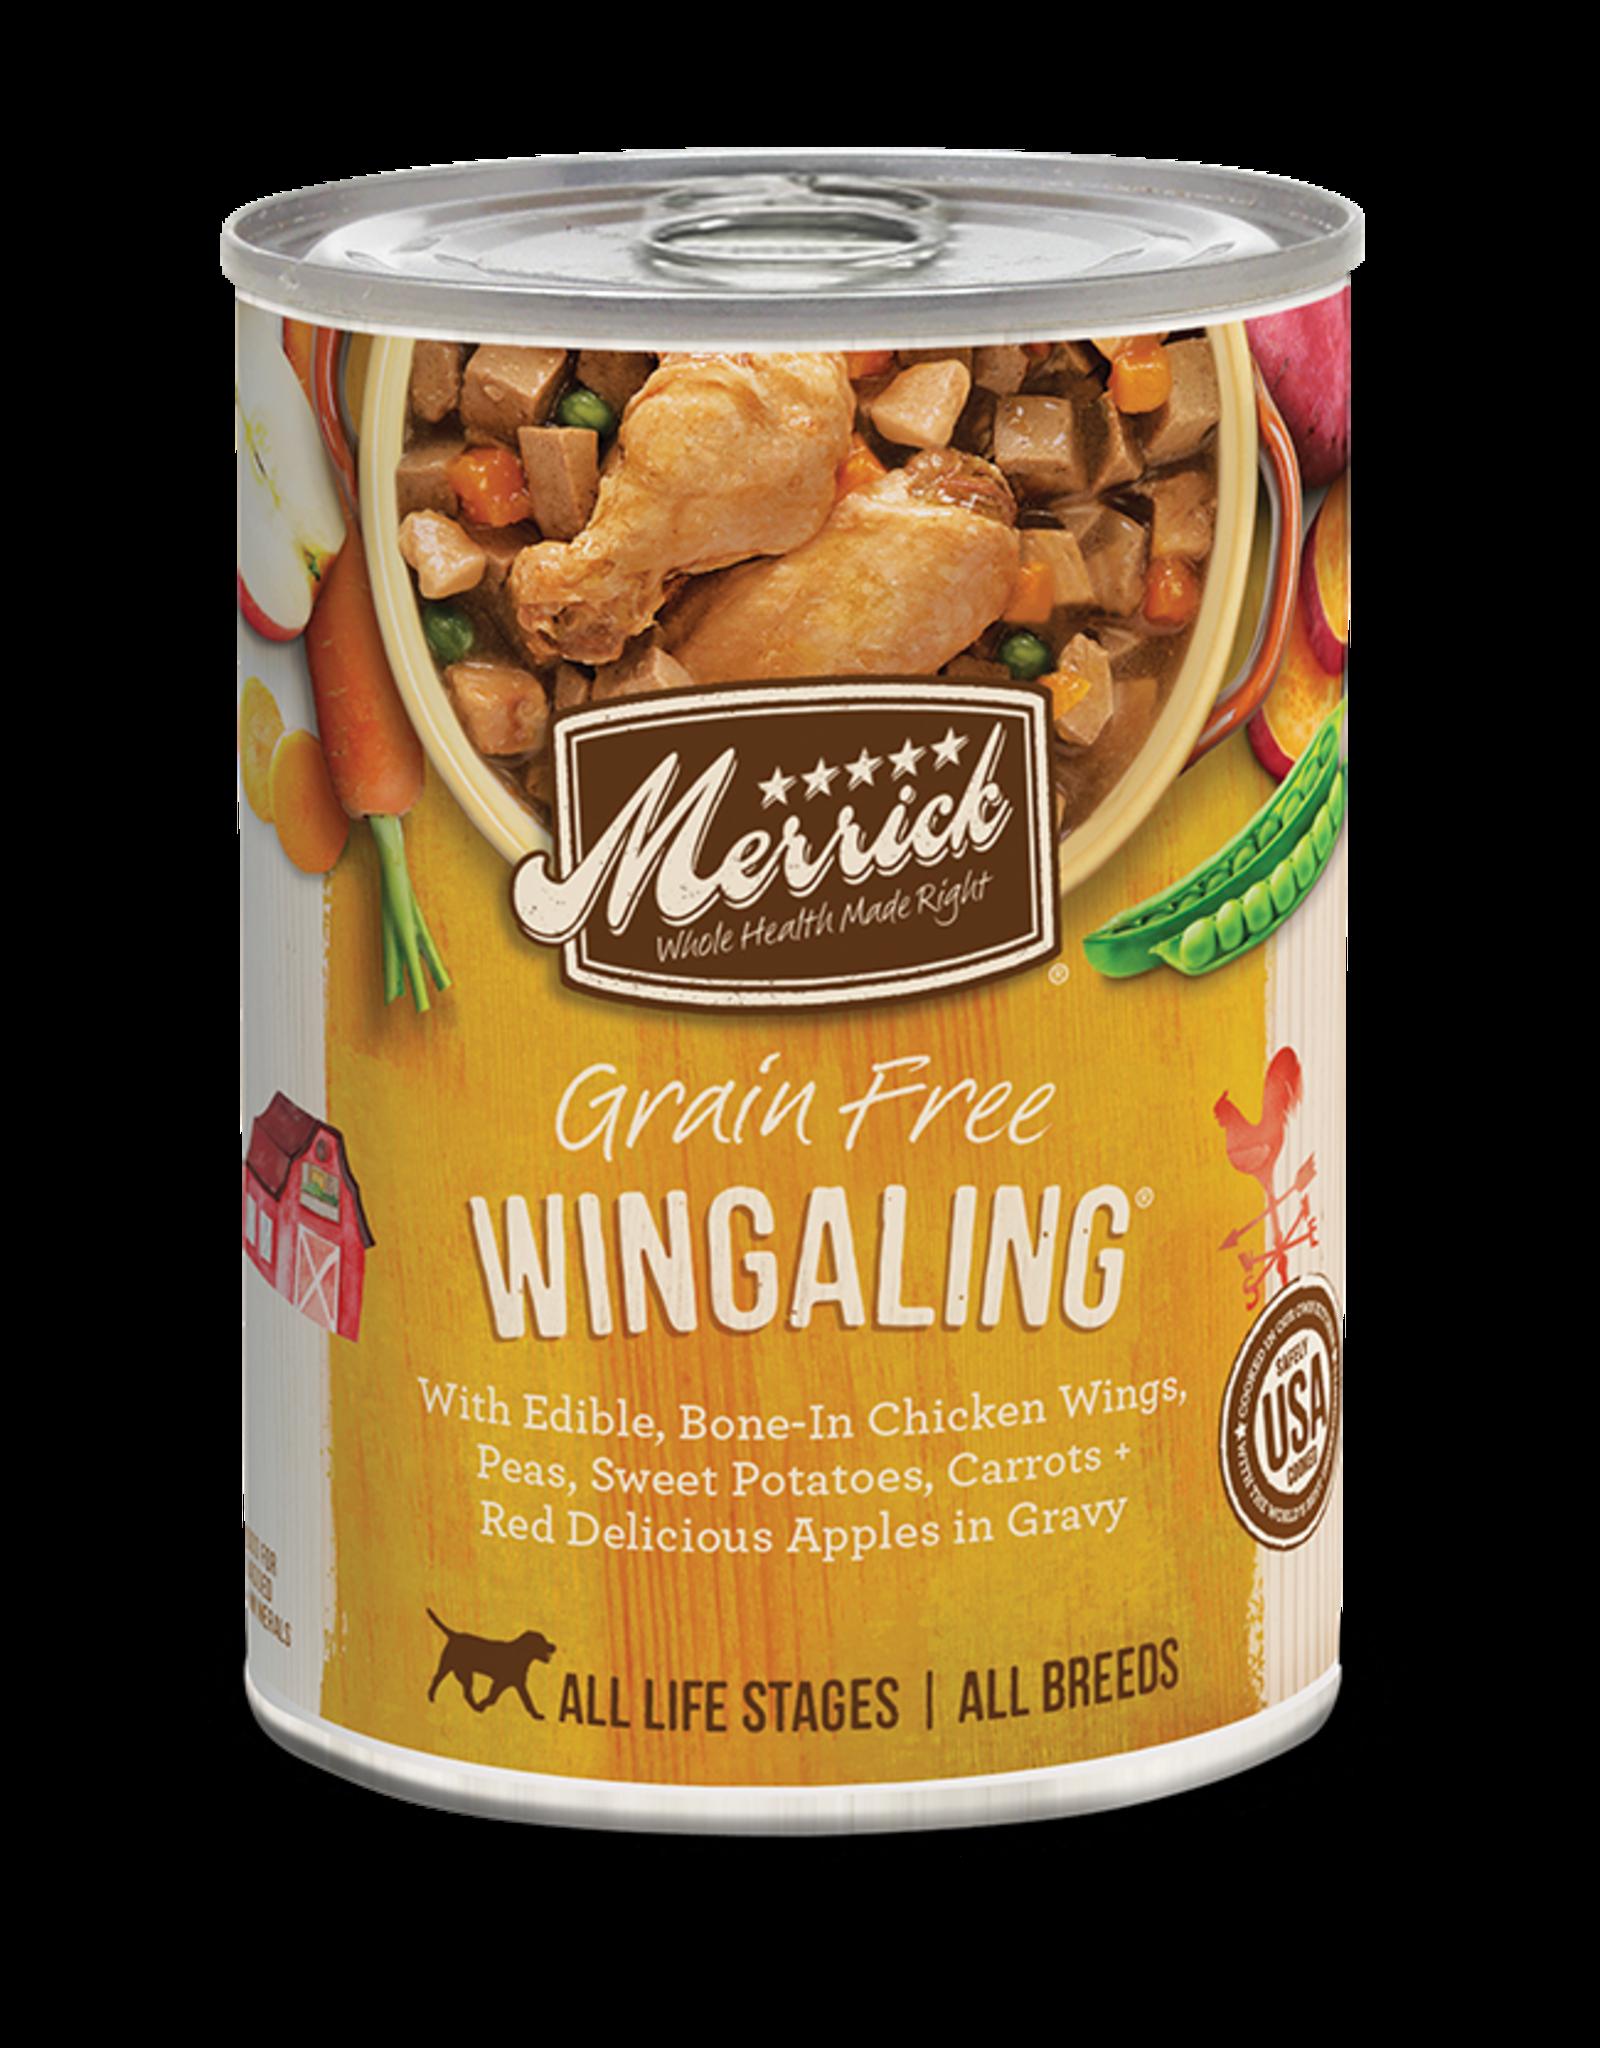 Merrick Merrick Grain-Free Wingaling in Gravy Dog Food 12.7oz